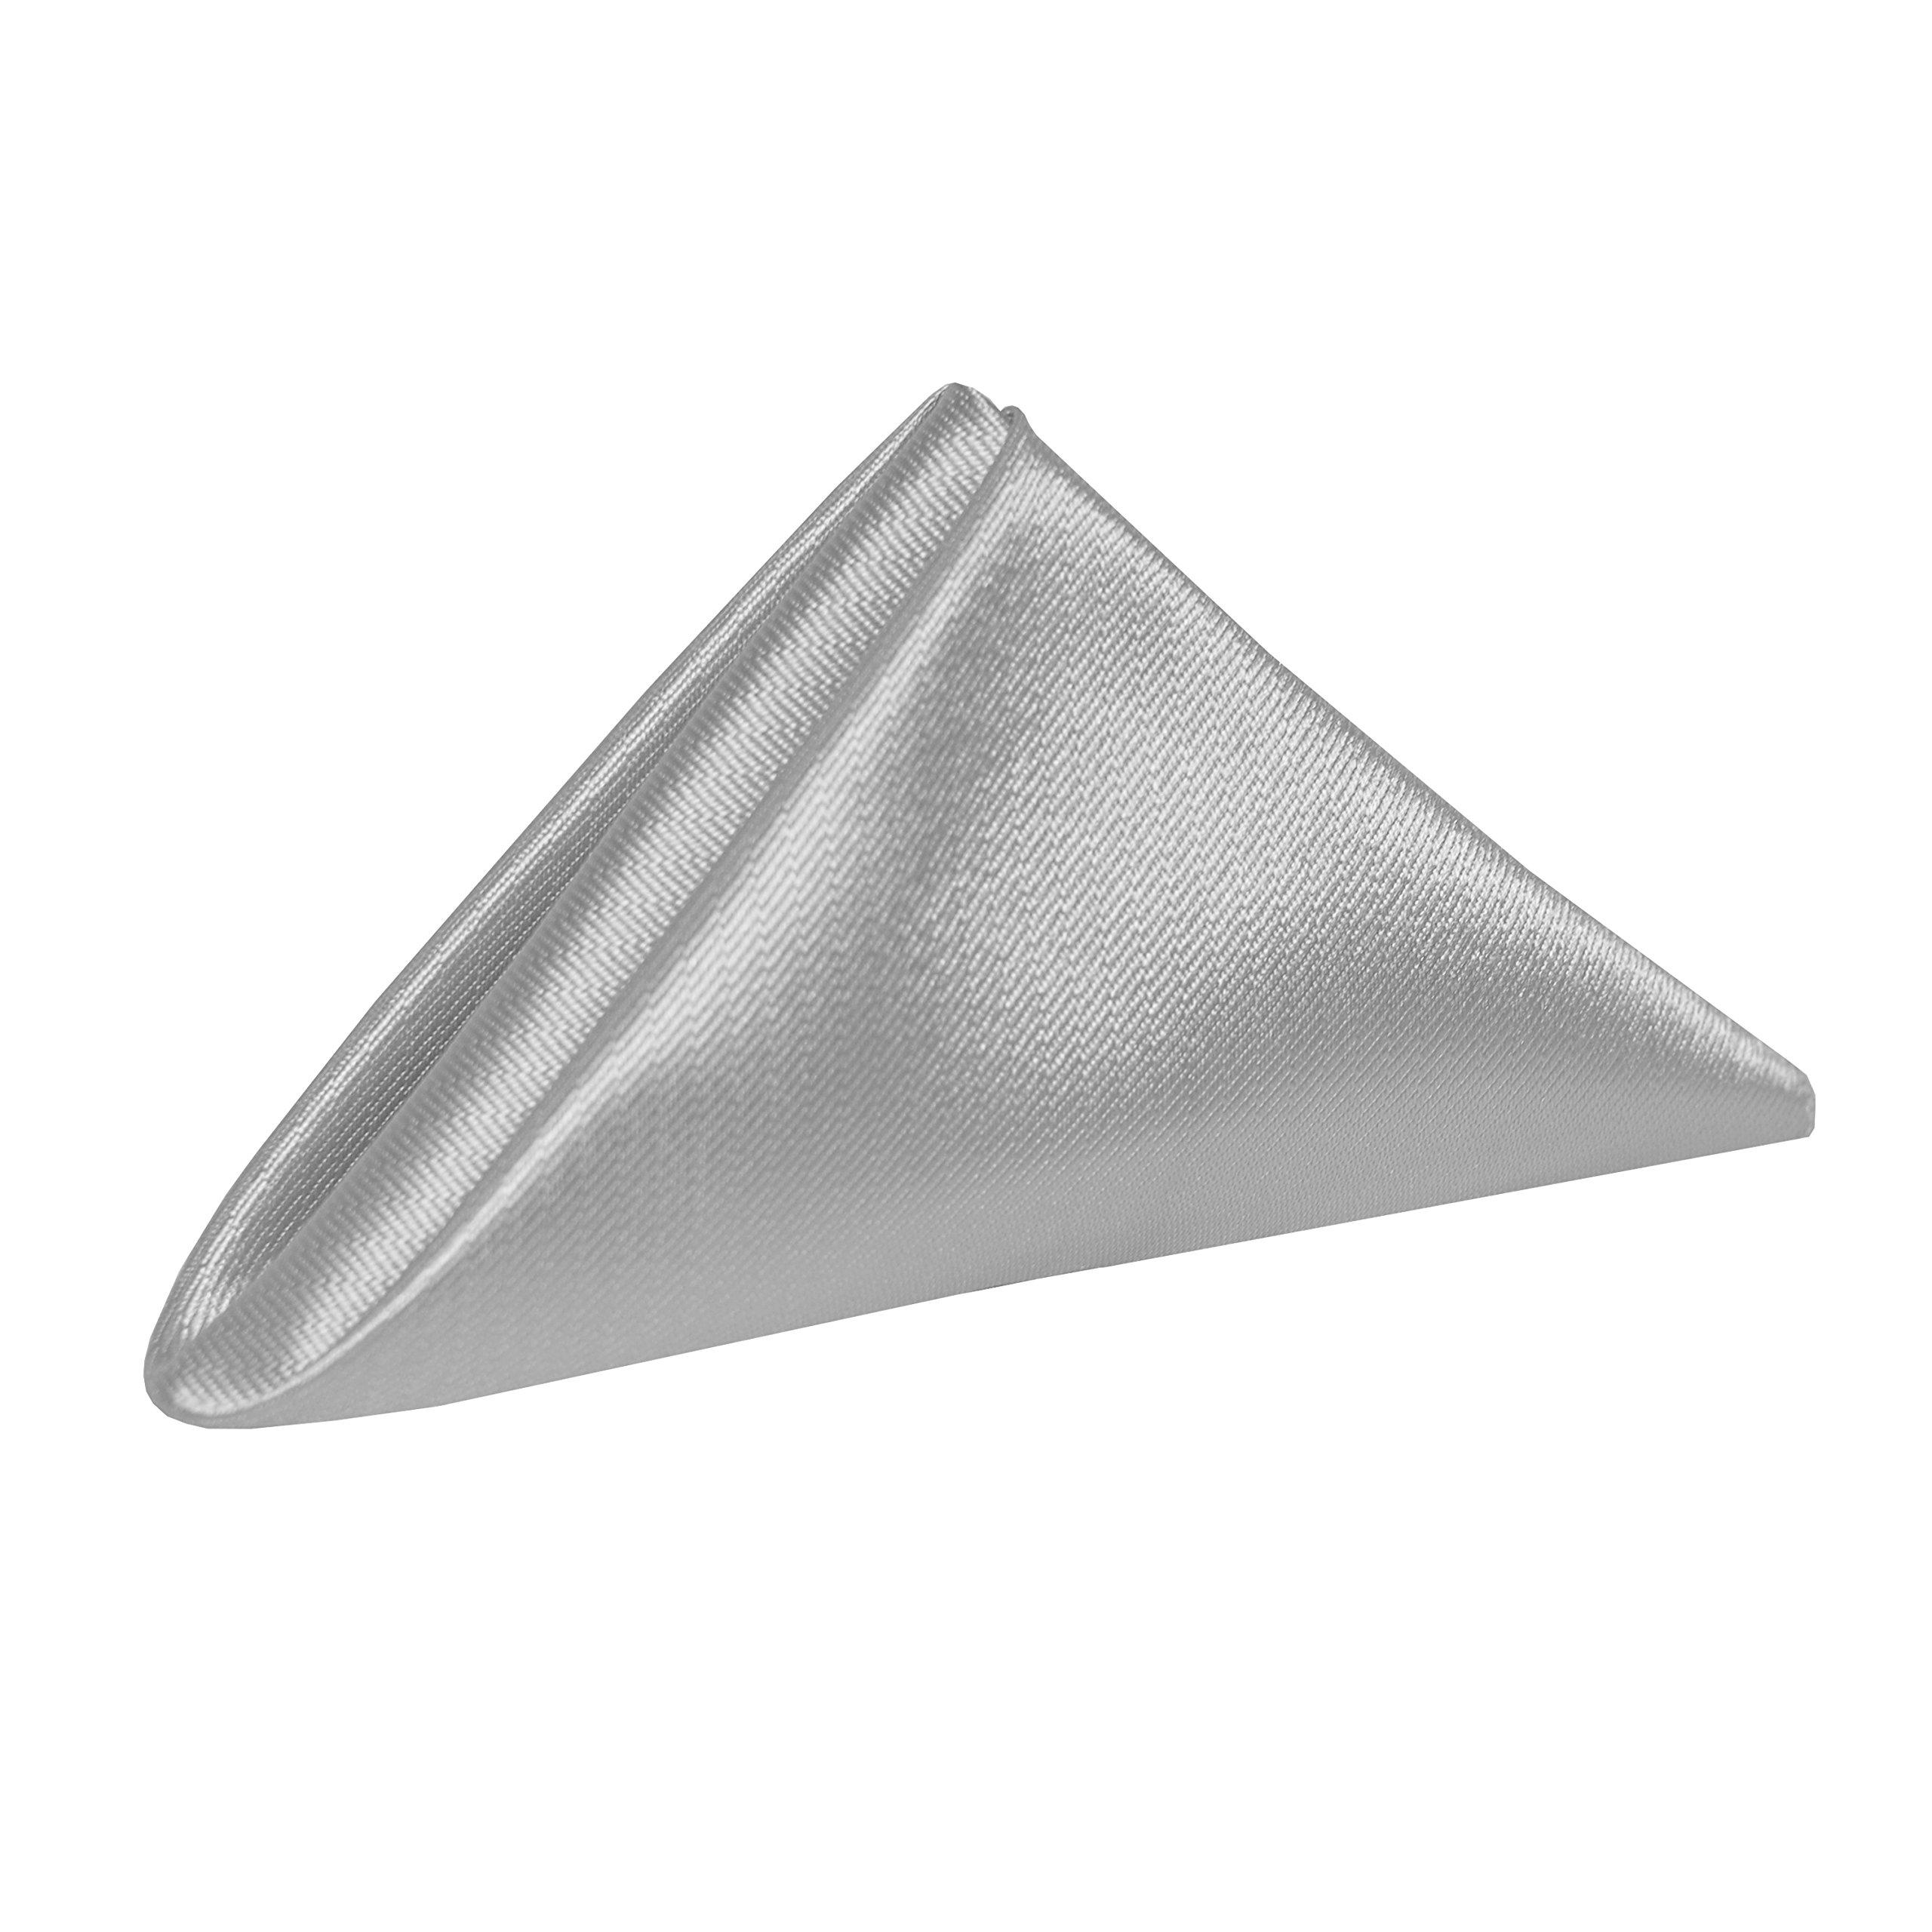 Ultimate Textile (10 Dozen) Herringbone - Fandango 20 x 20-Inch Napkins, Silver Grey